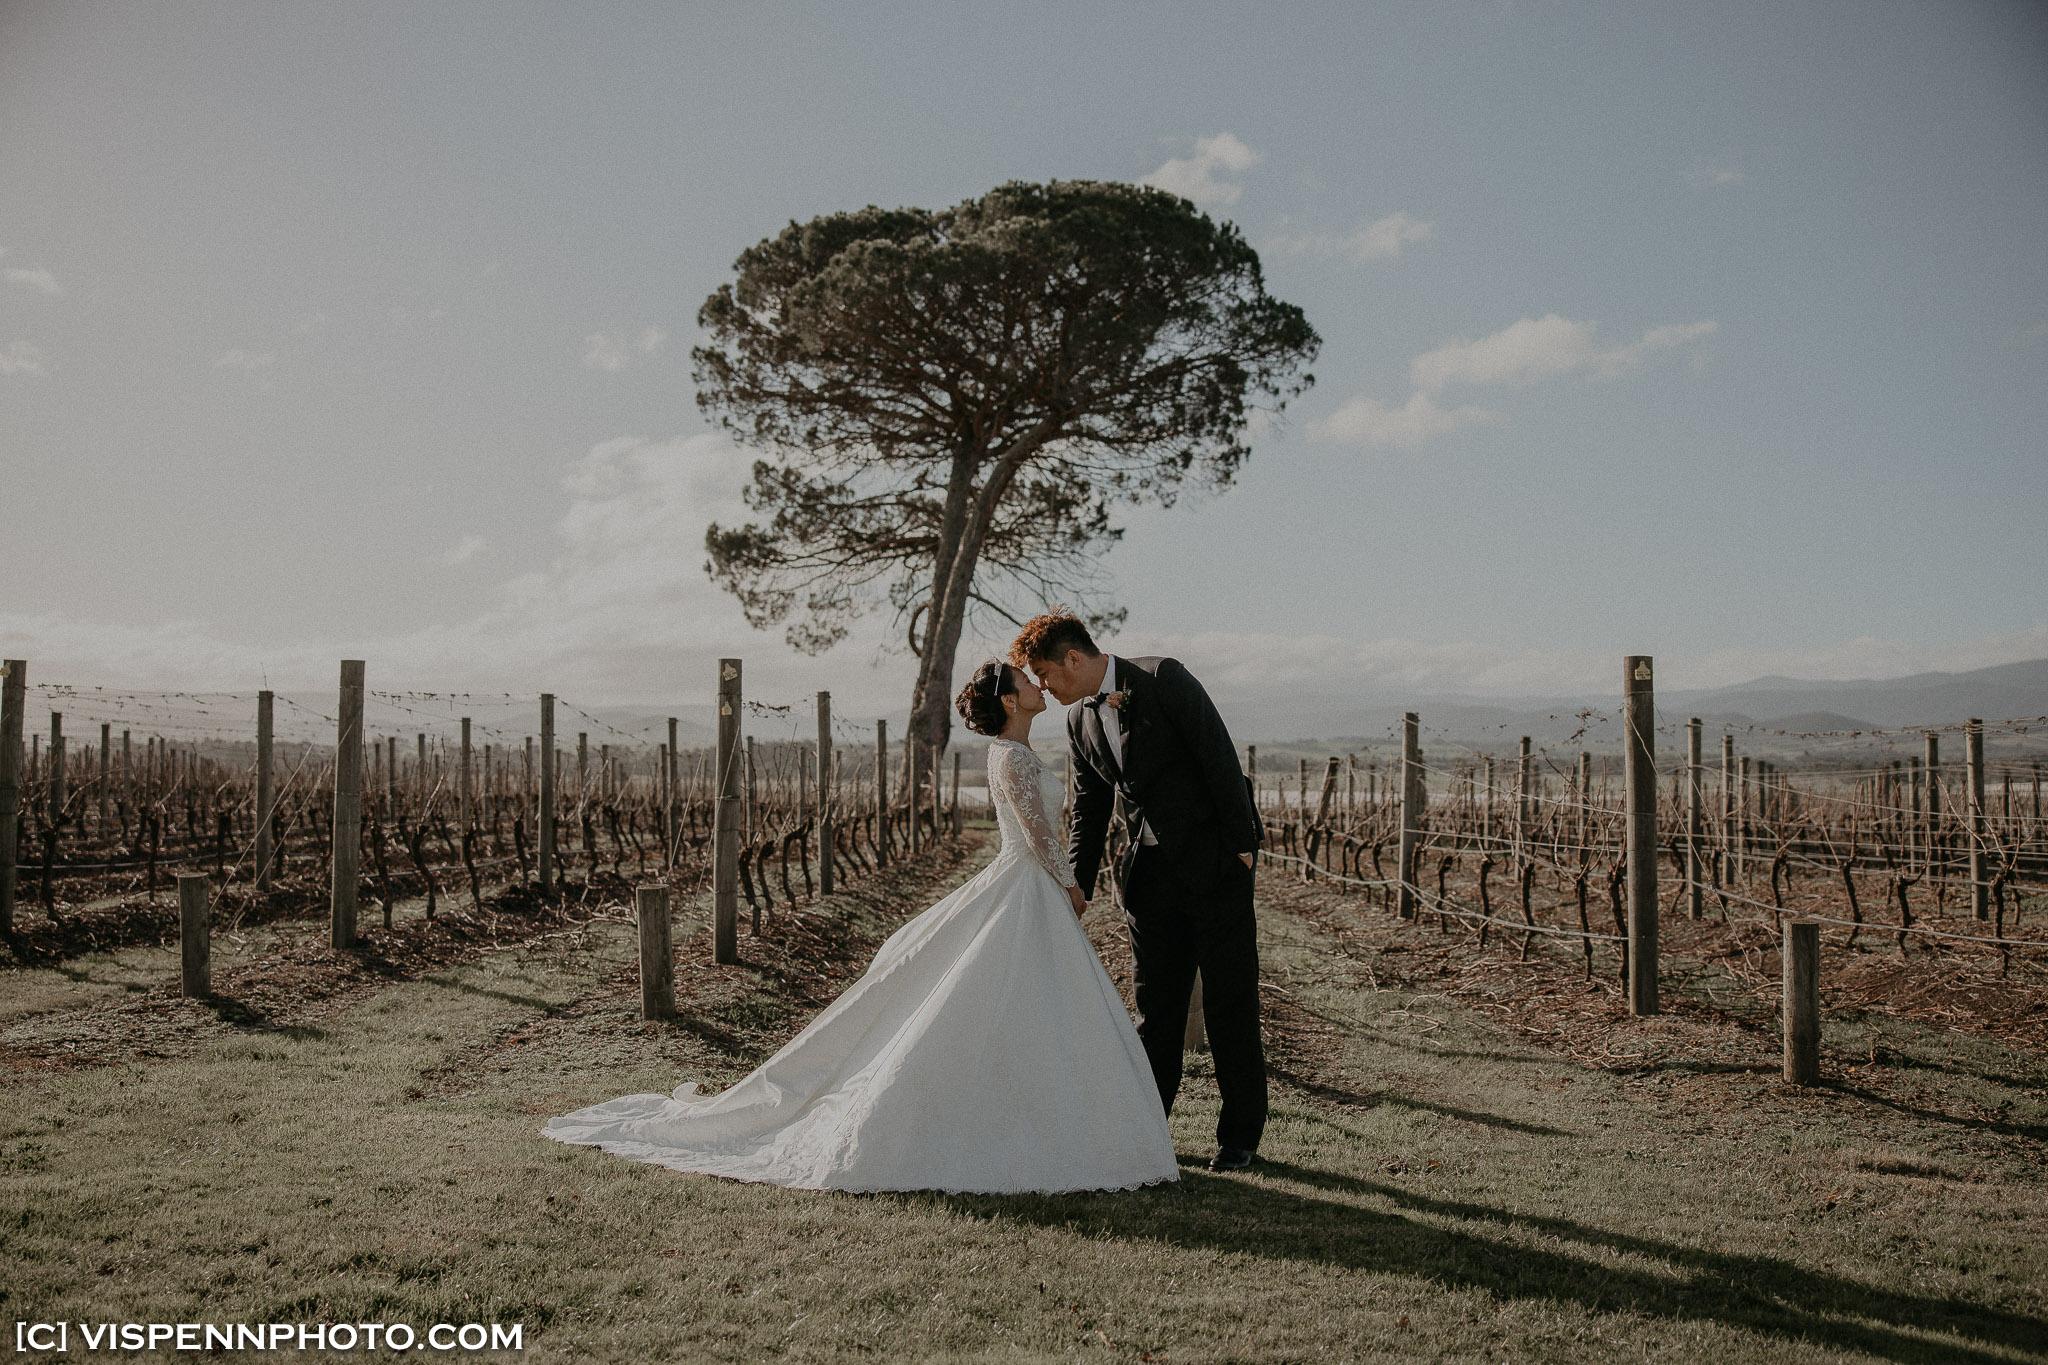 WEDDING DAY Photography Melbourne VISPENN 墨尔本 婚礼跟拍 婚礼摄像 婚礼摄影 结婚照 登记照 CoreyCoco 1P 02269 EOSR VISPENN